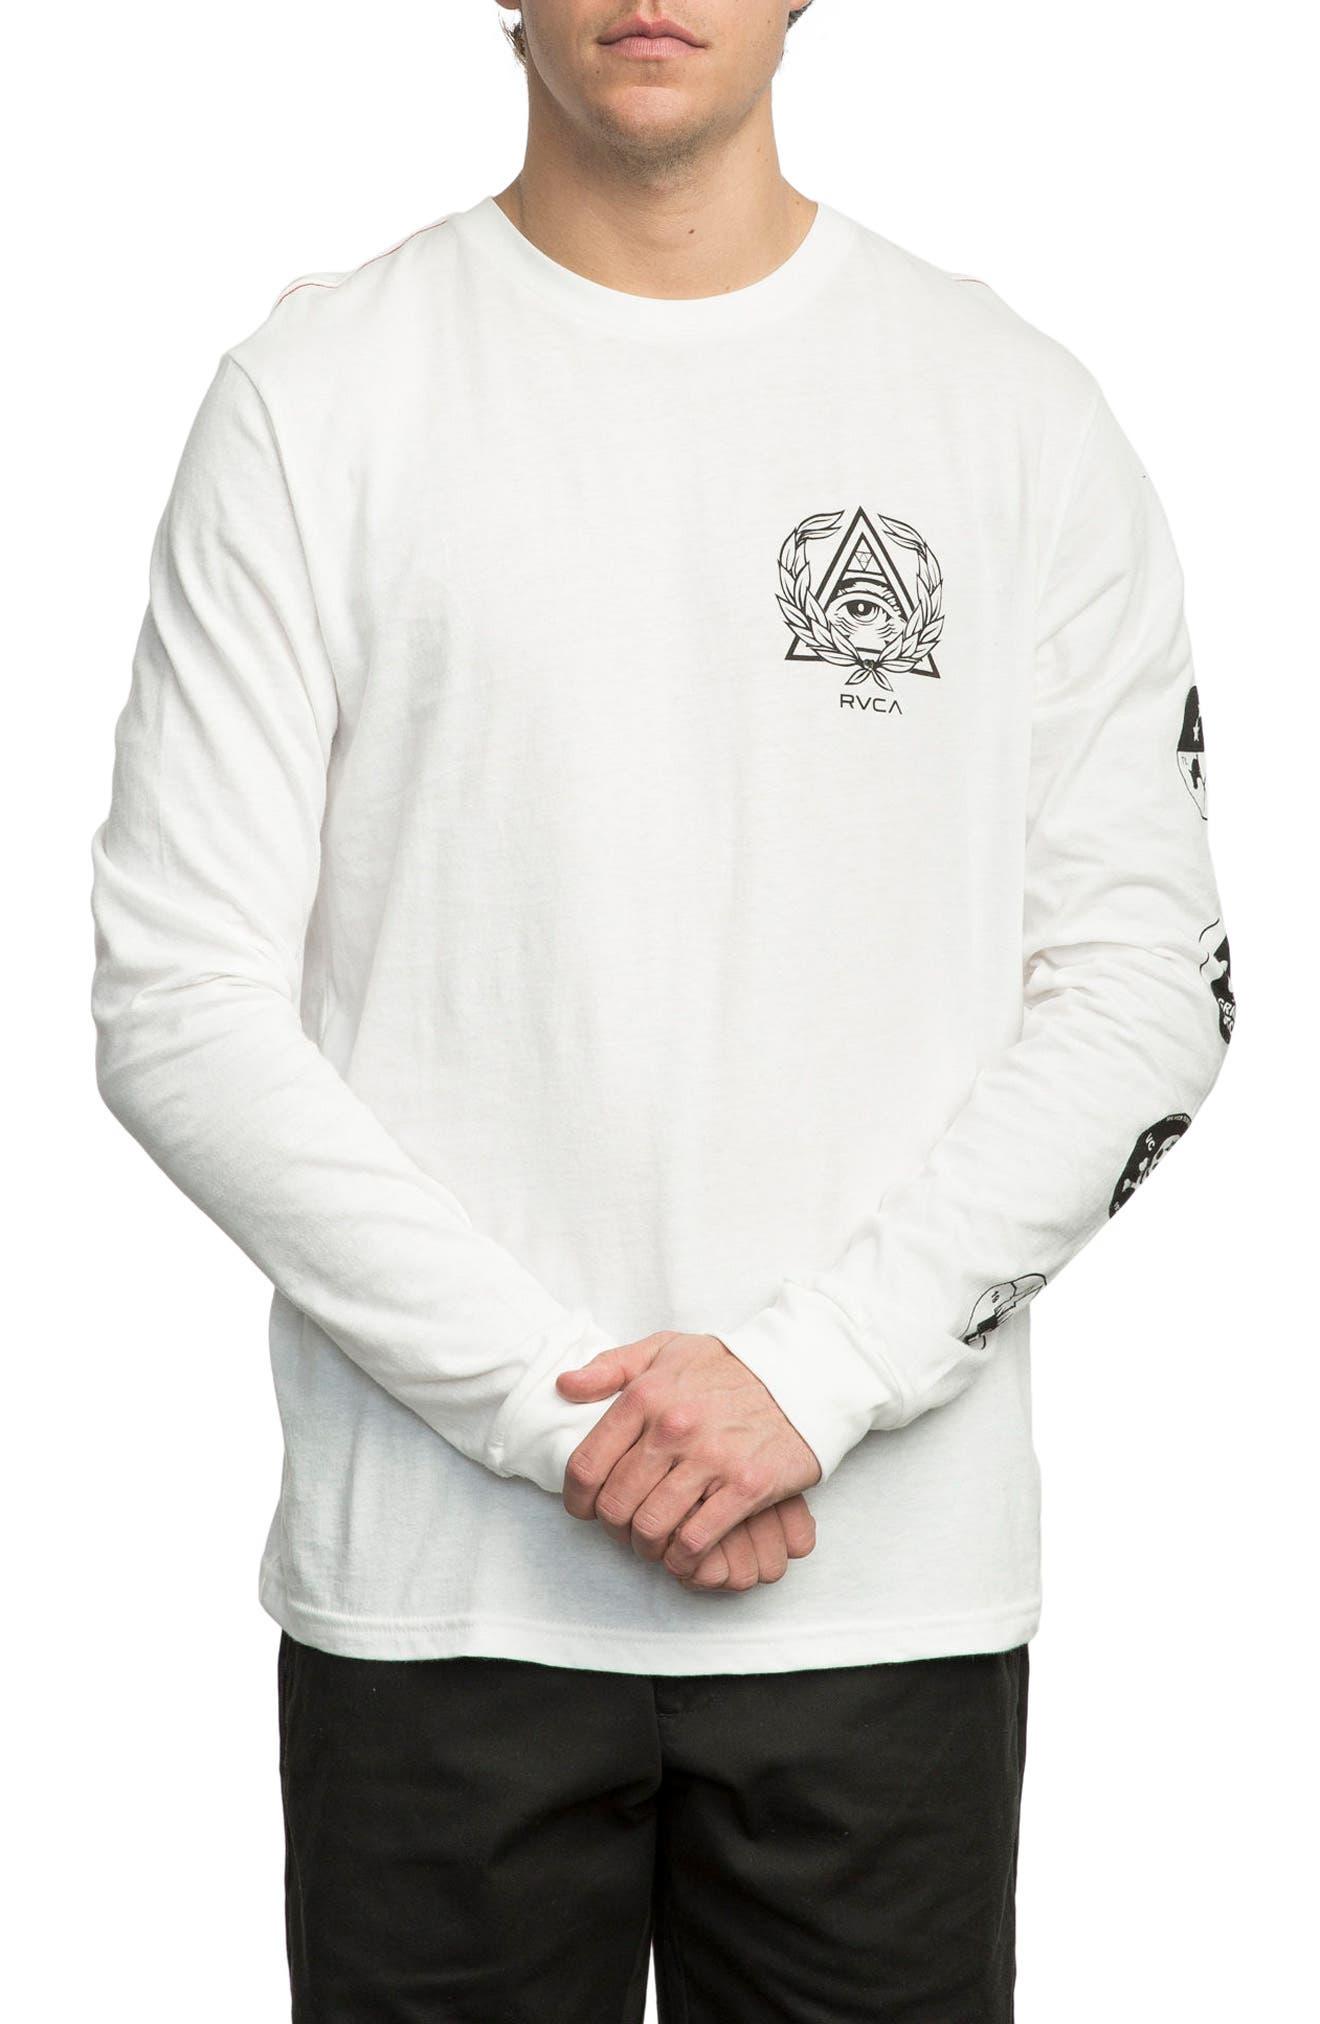 RVCA Prigus Sport Team T-Shirt